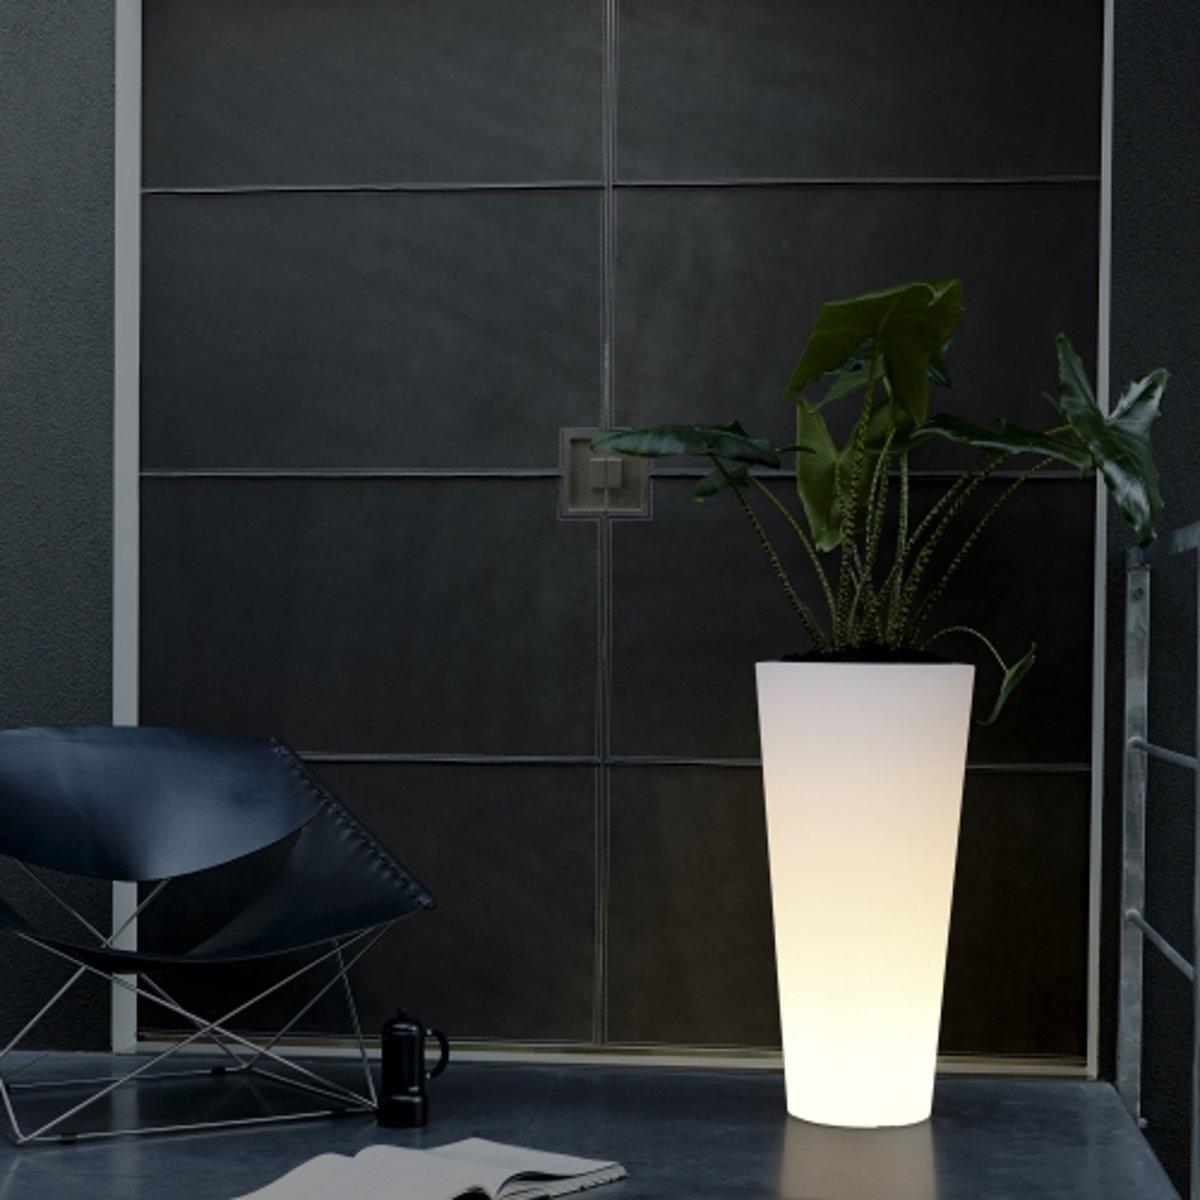 LED plantenpot kopen